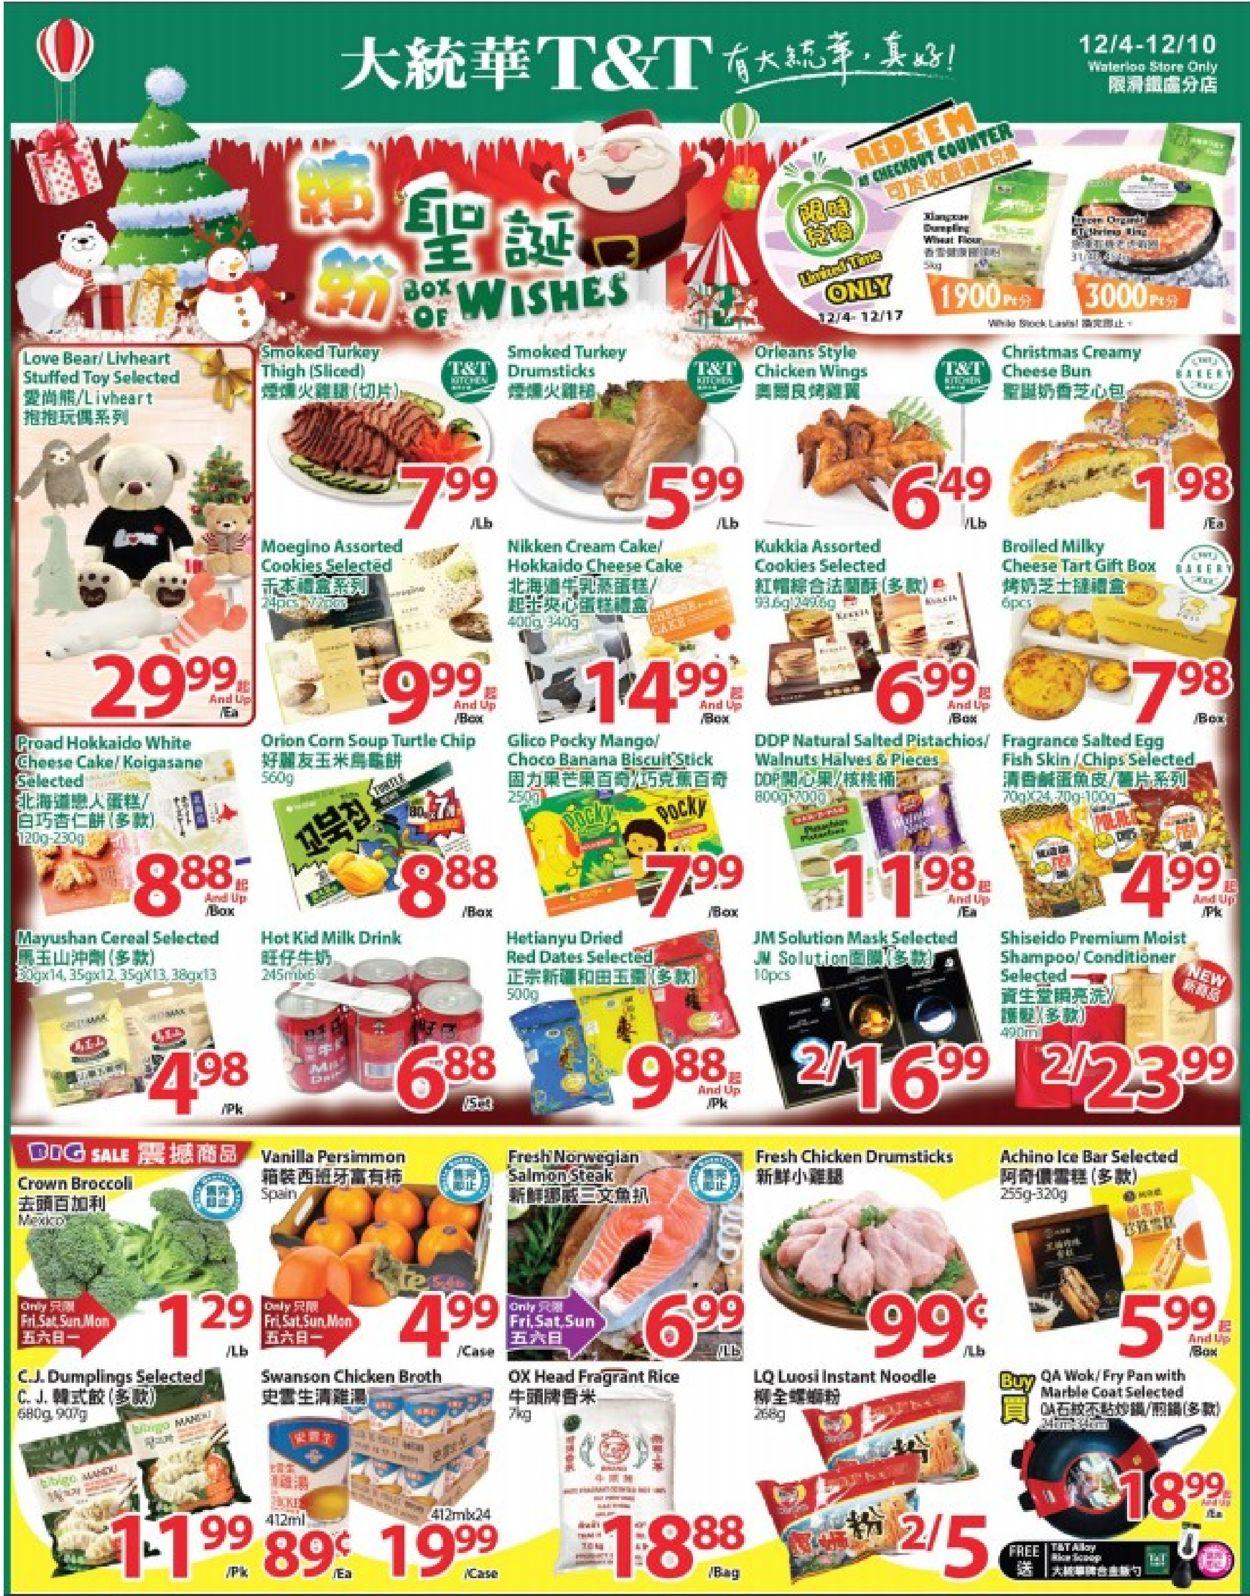 T&T Supermarket Christmas 2020 - Waterloo Flyer - 12/04-12/10/2020